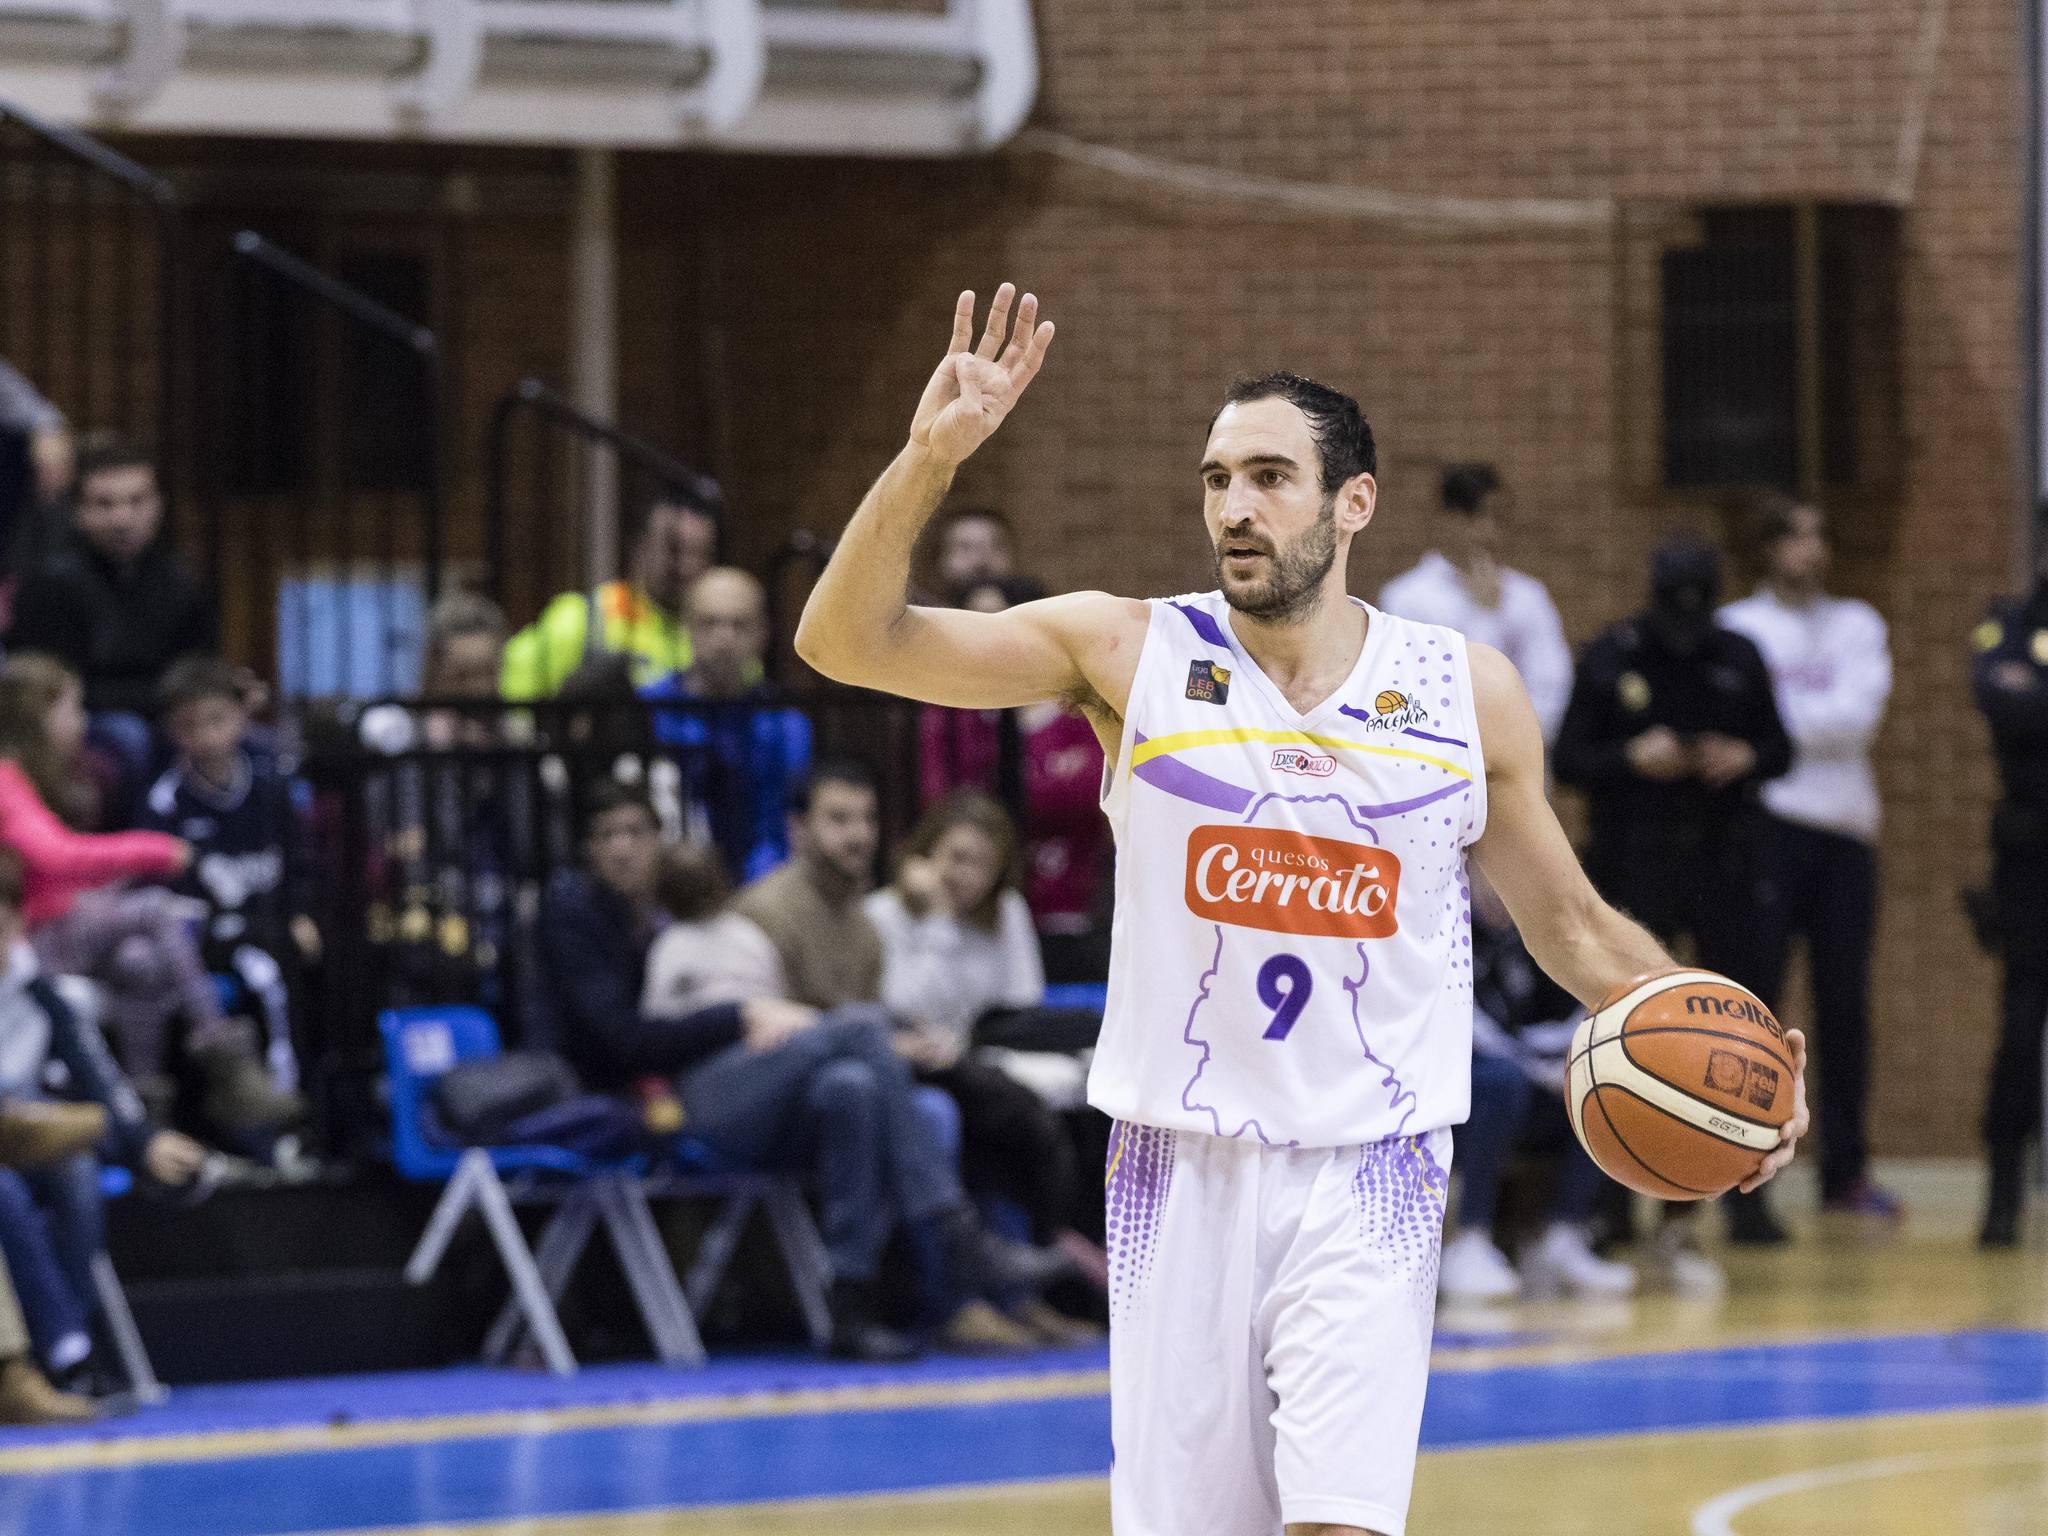 Manu Rodríguez dirigiendo el ataque (Foto: Christian García)